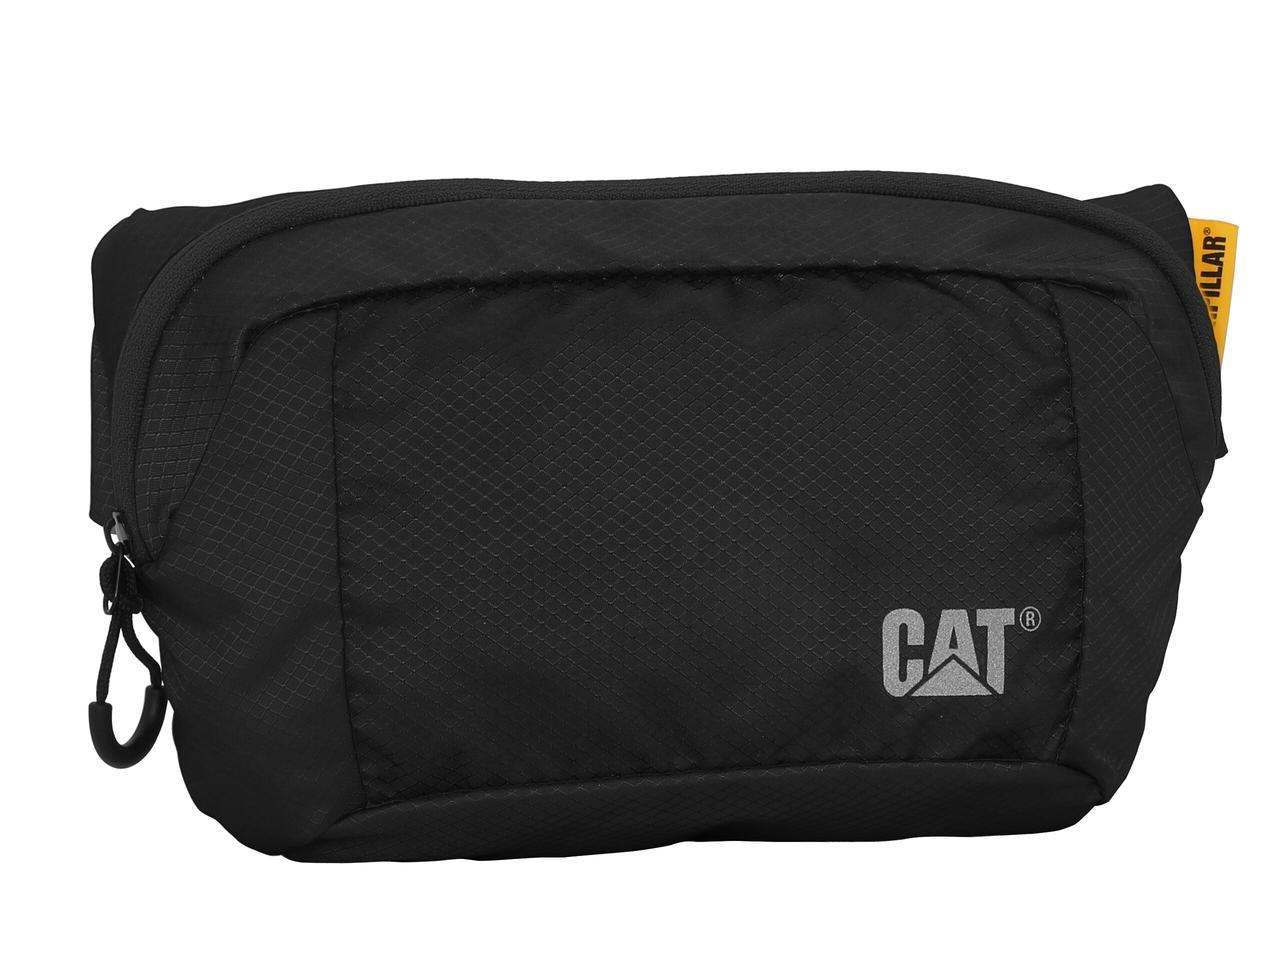 Сумка на пояс CAT Urban Mountaineer 83834;01 чорний